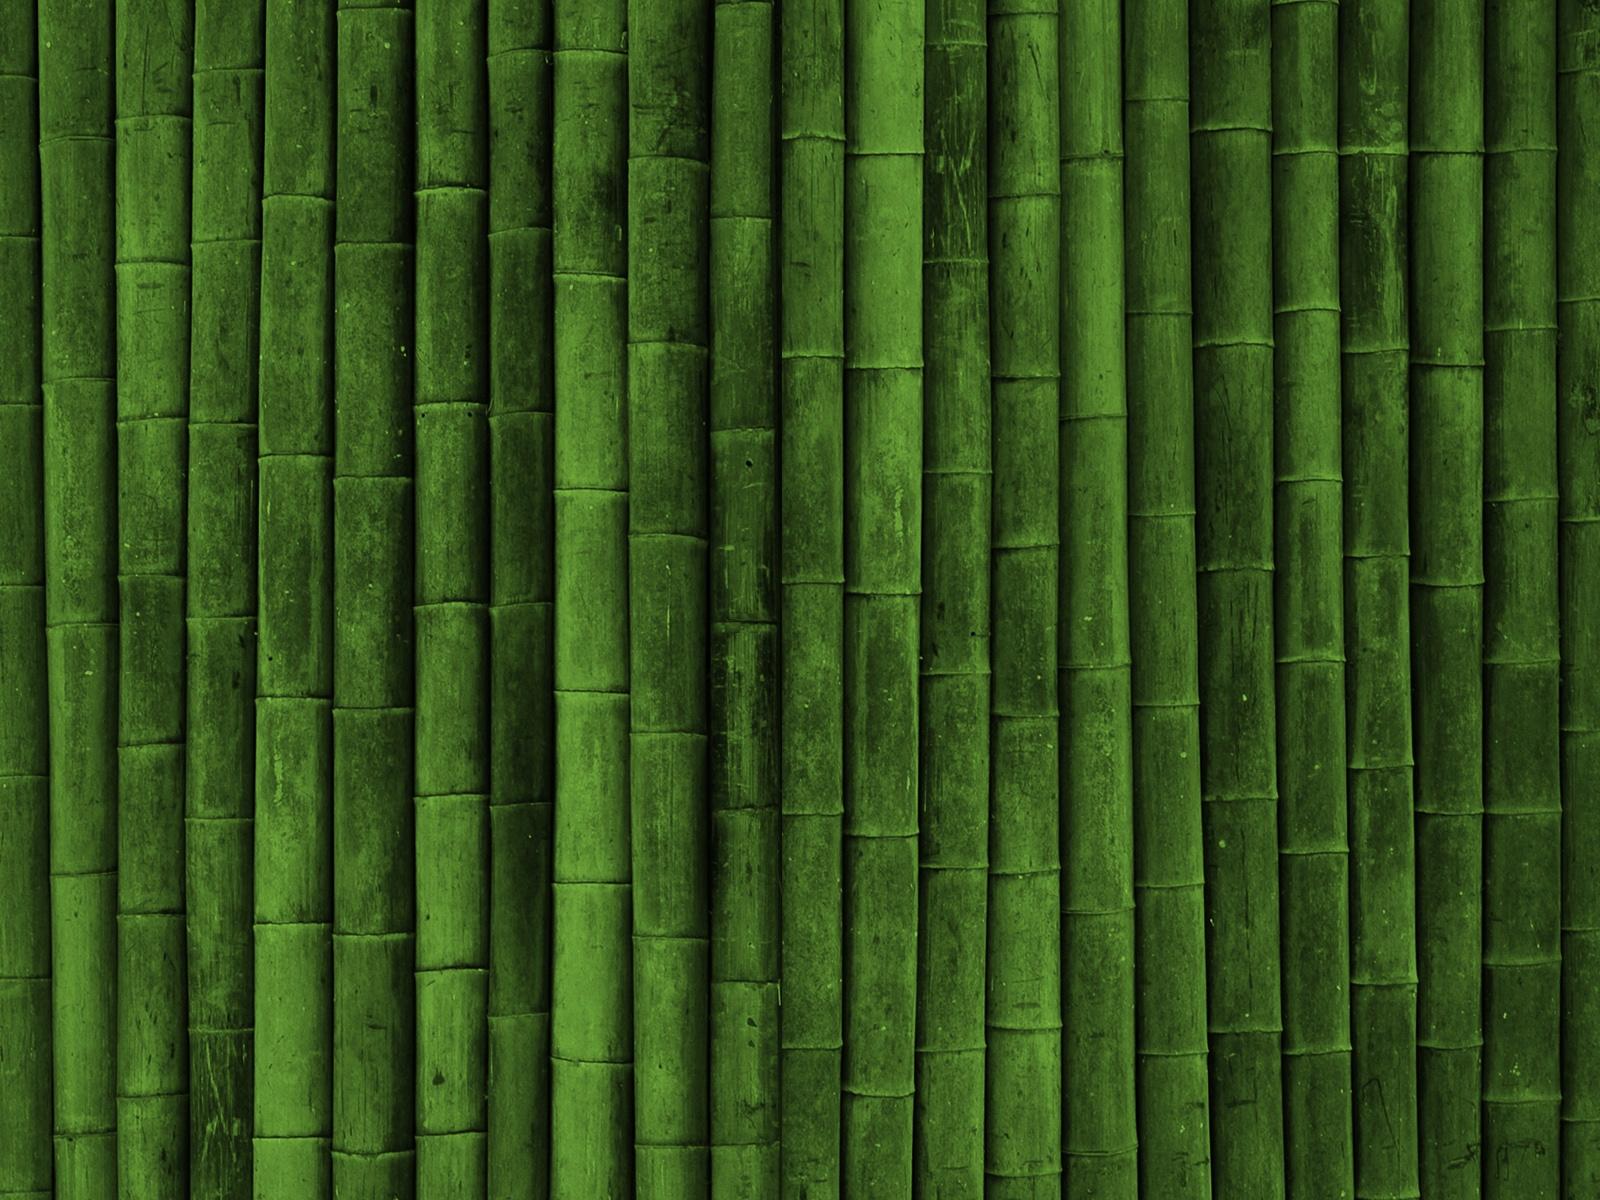 Bamboo Wallpaper Bamboo Textured Wallpaper